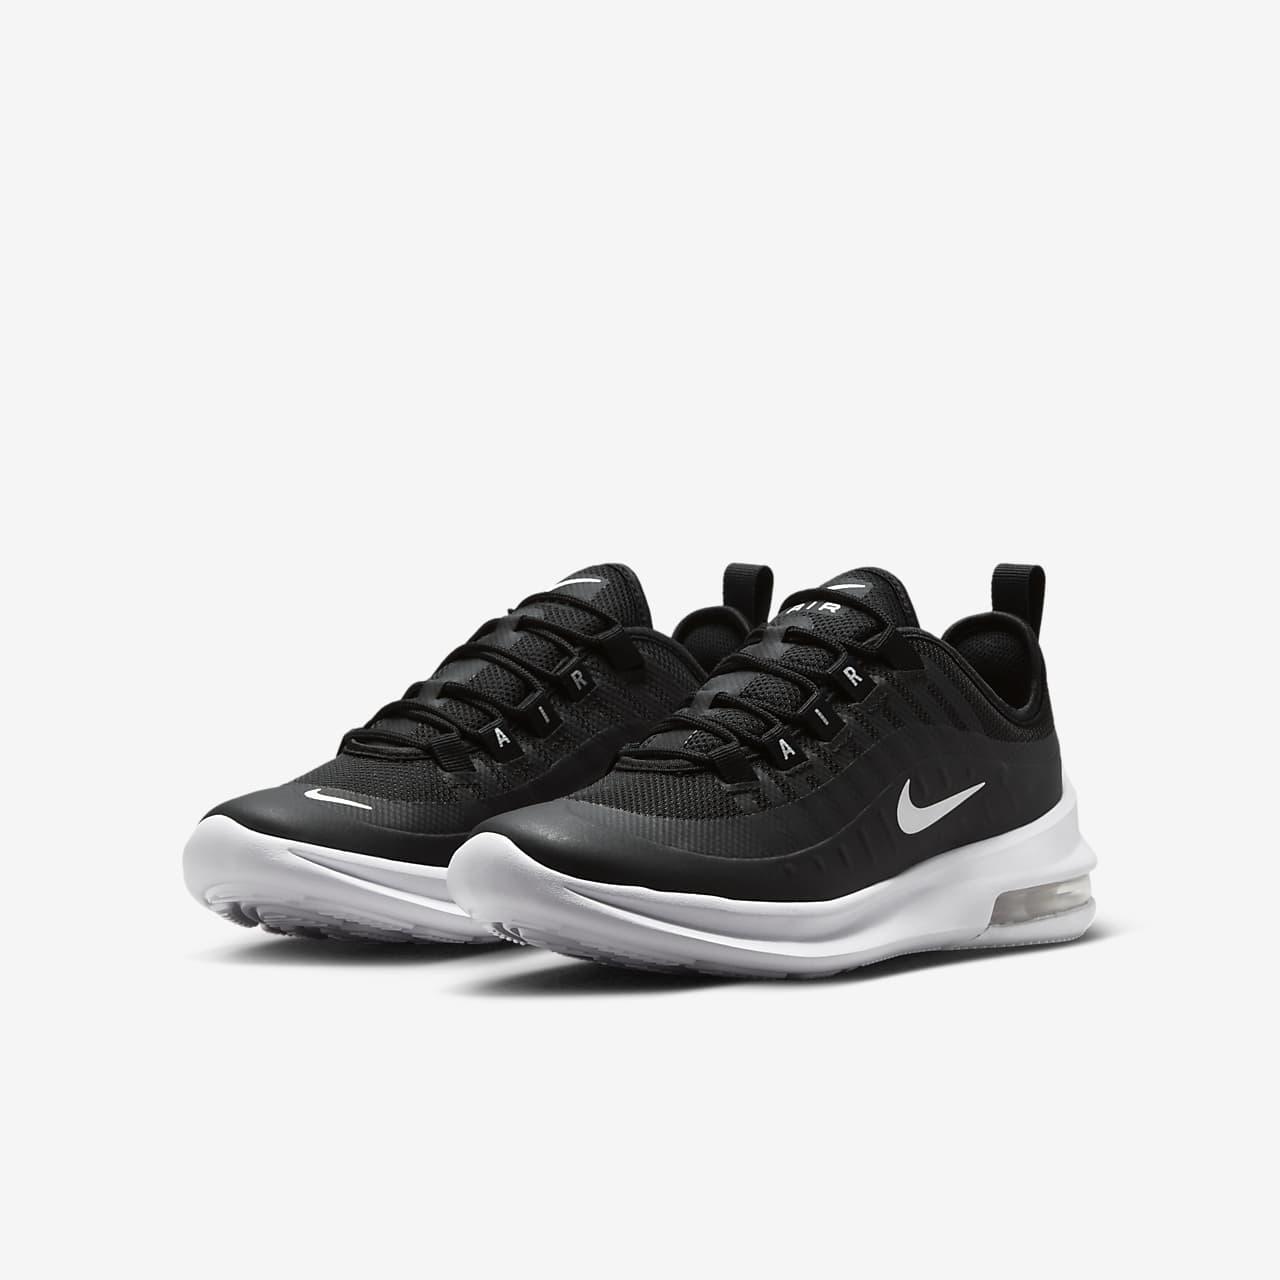 huge discount 55319 92d2f ... Nike Air Max Axis Schuh für ältere Kinder